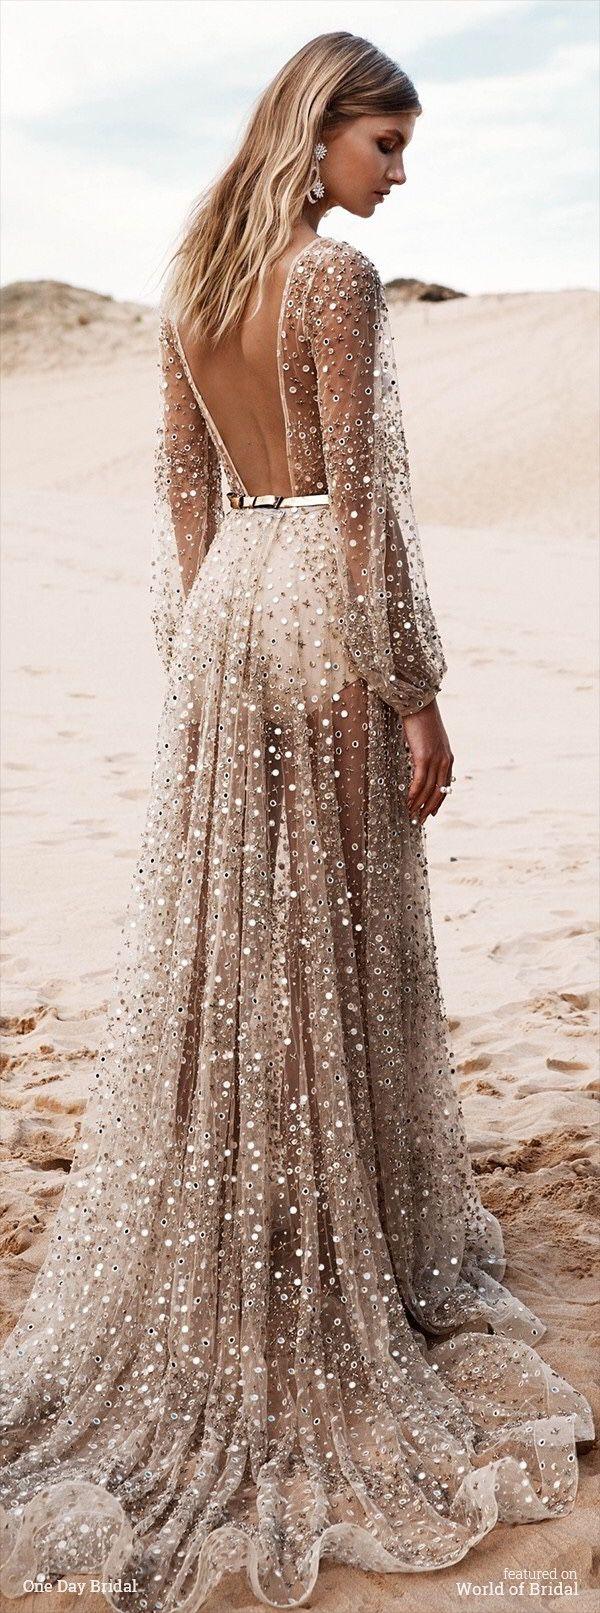 Beautiful. Source: http://www.worldofbridal.com/2016/05/one-day-bridal-2016-wedding-dresses/